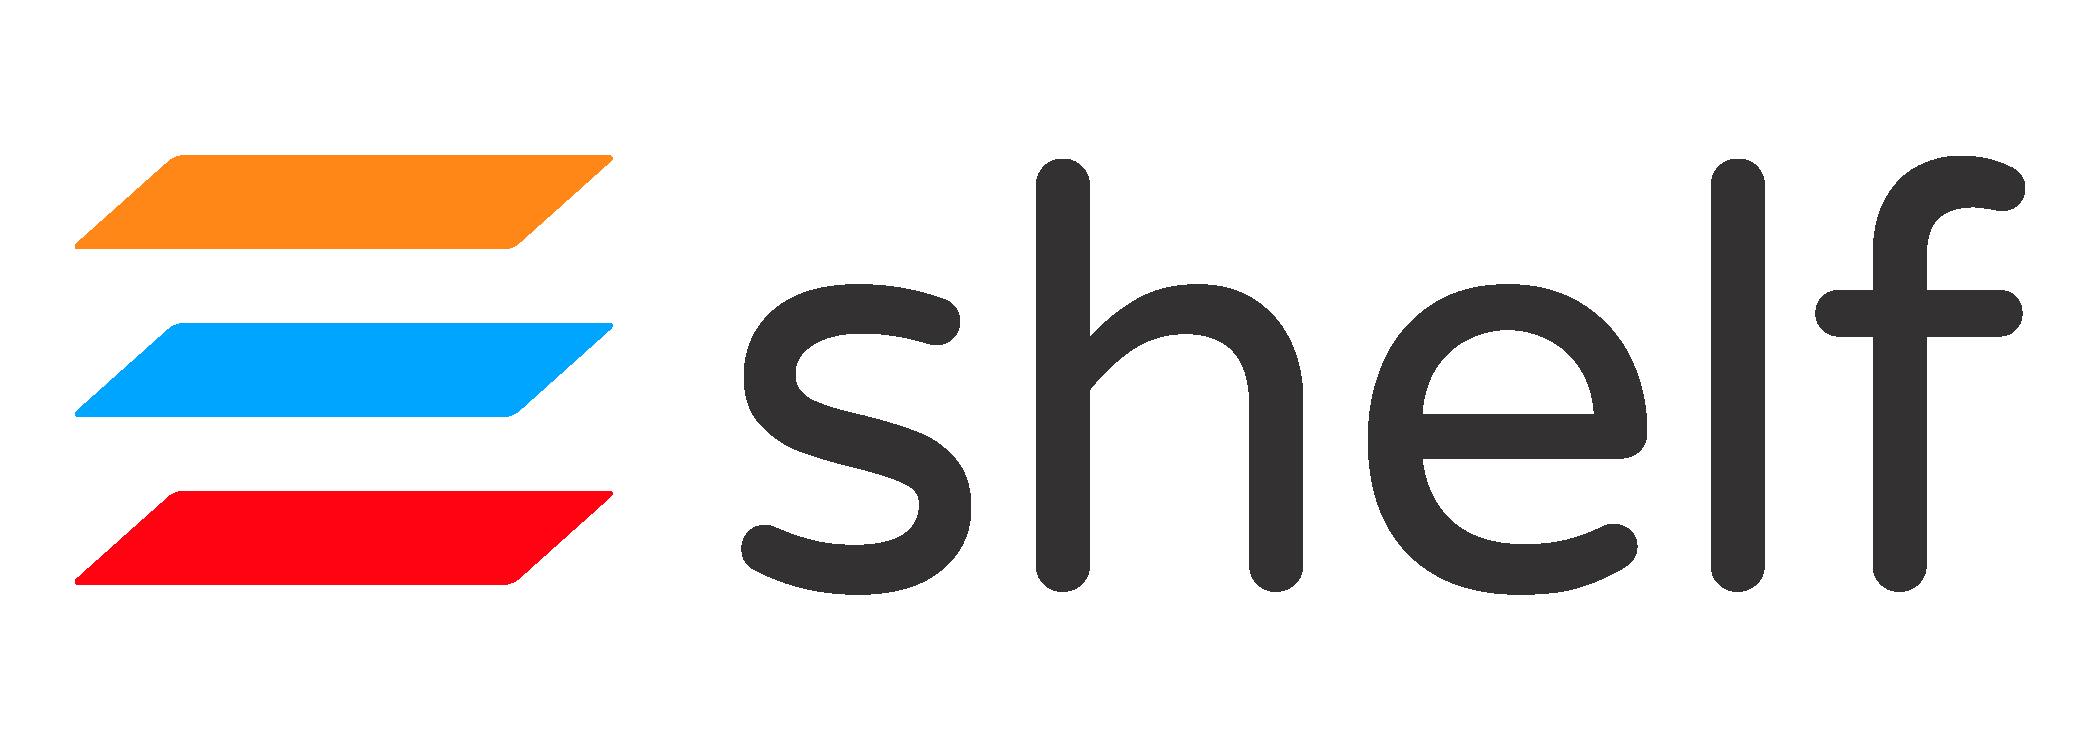 Shelf Knowledge Management Platform logo